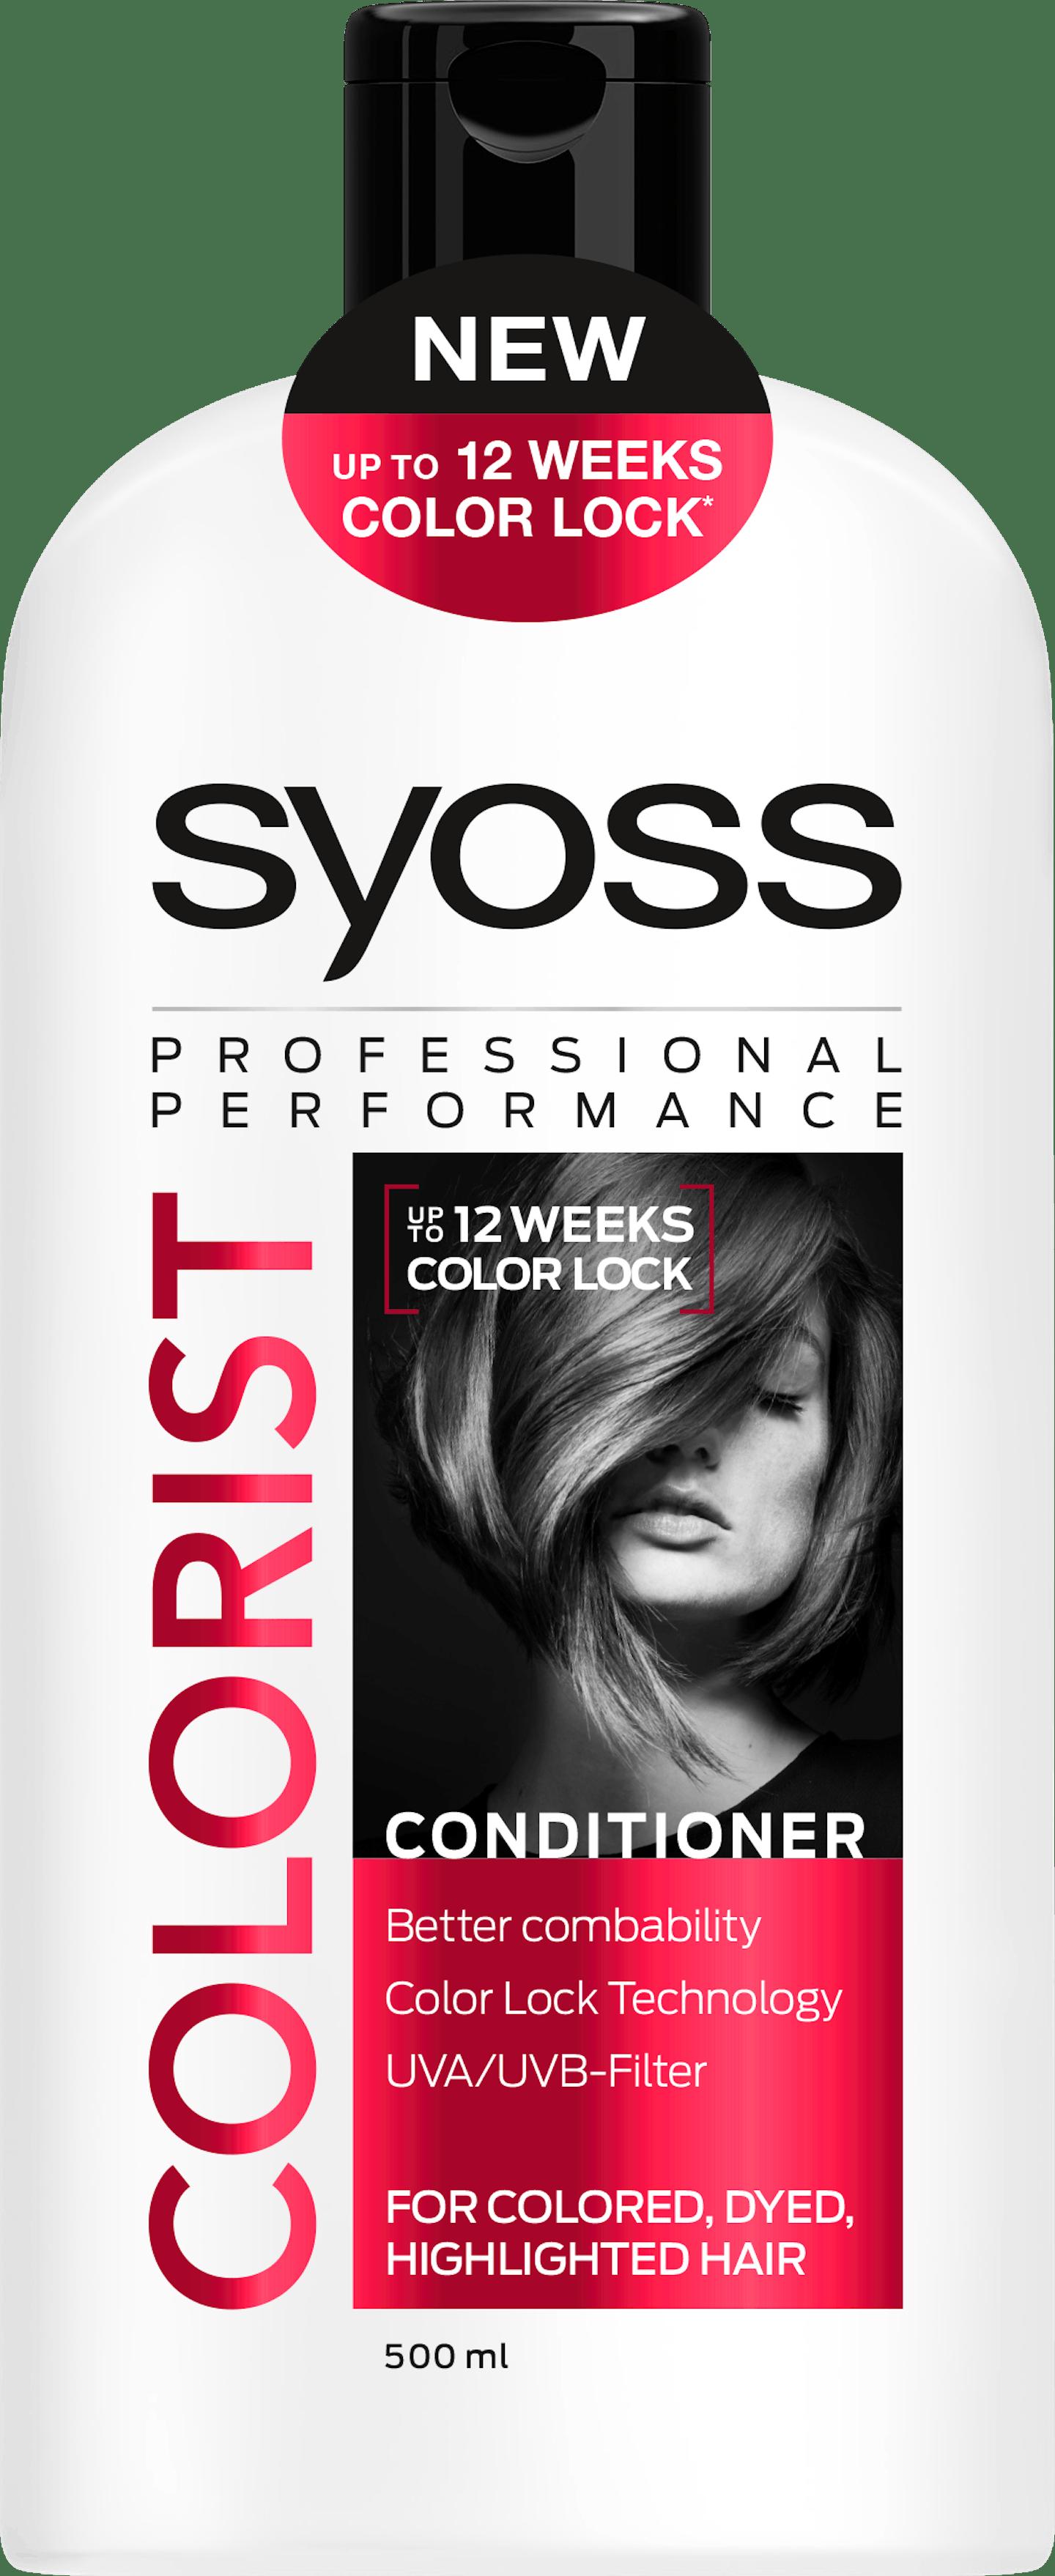 Syoss Colorist Conditioner